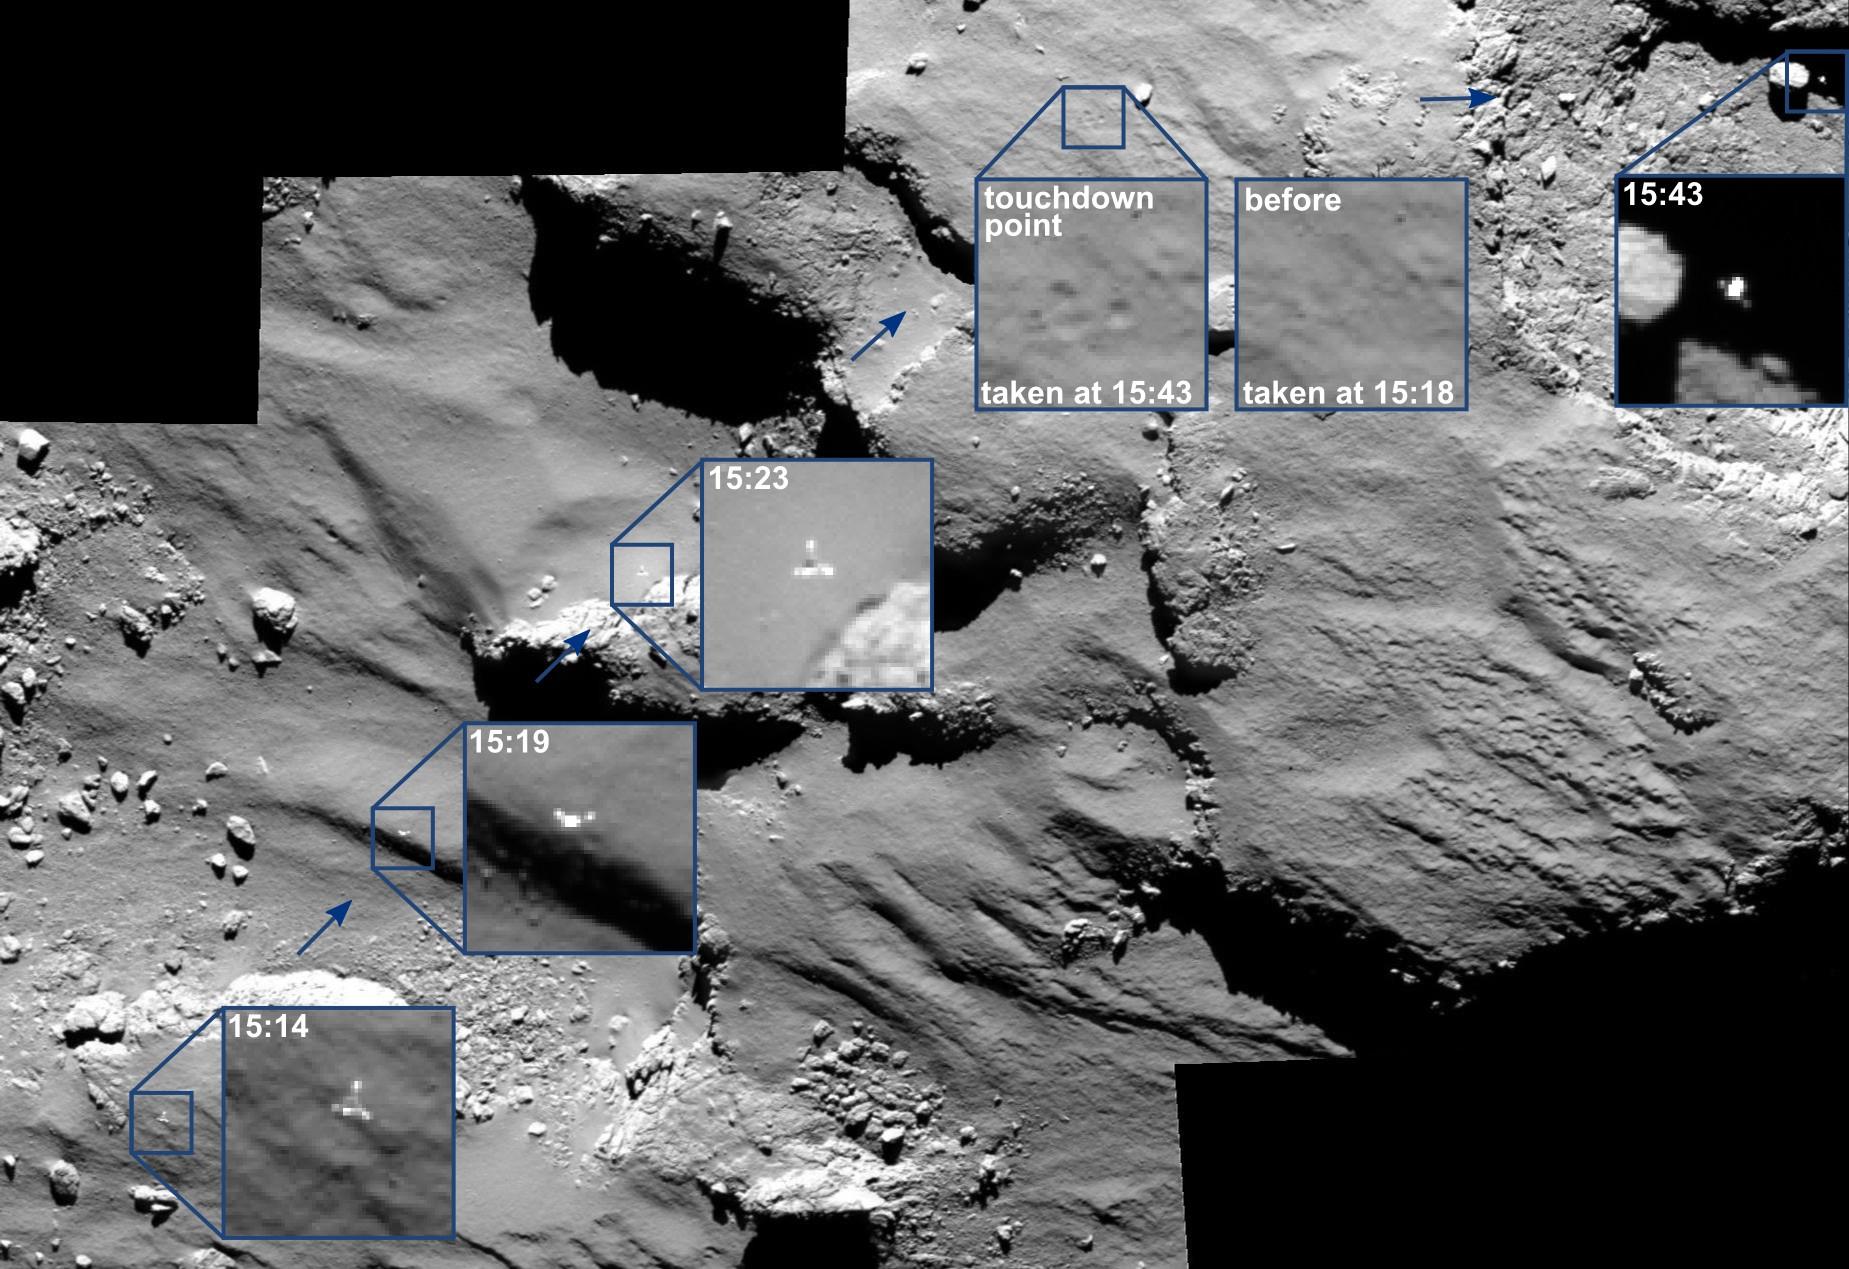 Philae Comet Lander's Big Bounce Captured in Amazing Photos